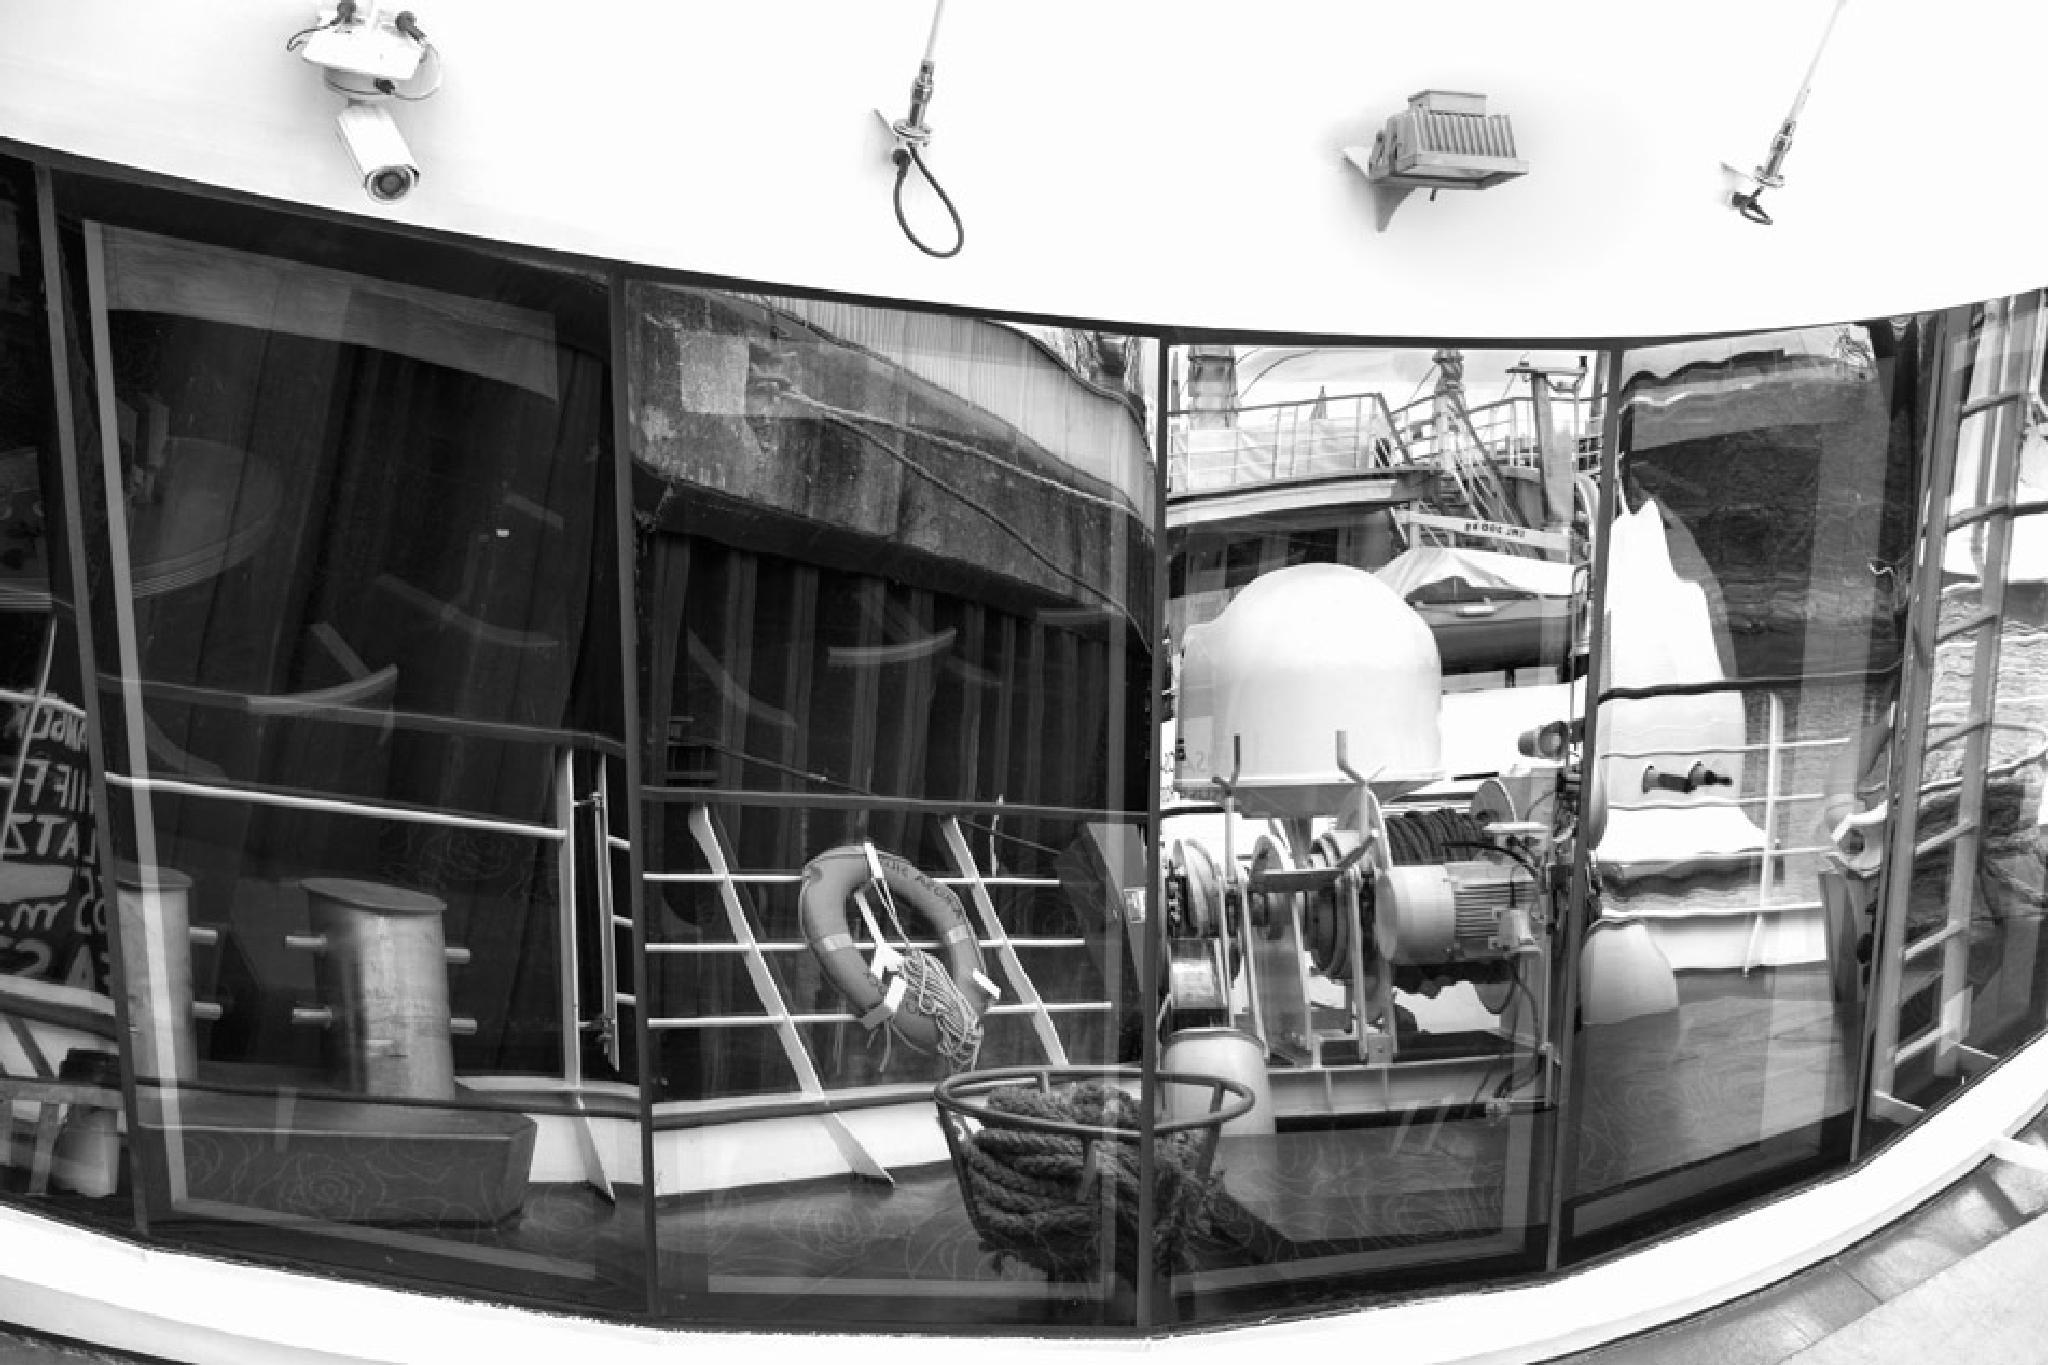 Dreamboat 4.0 by agfa.scala ...the eye